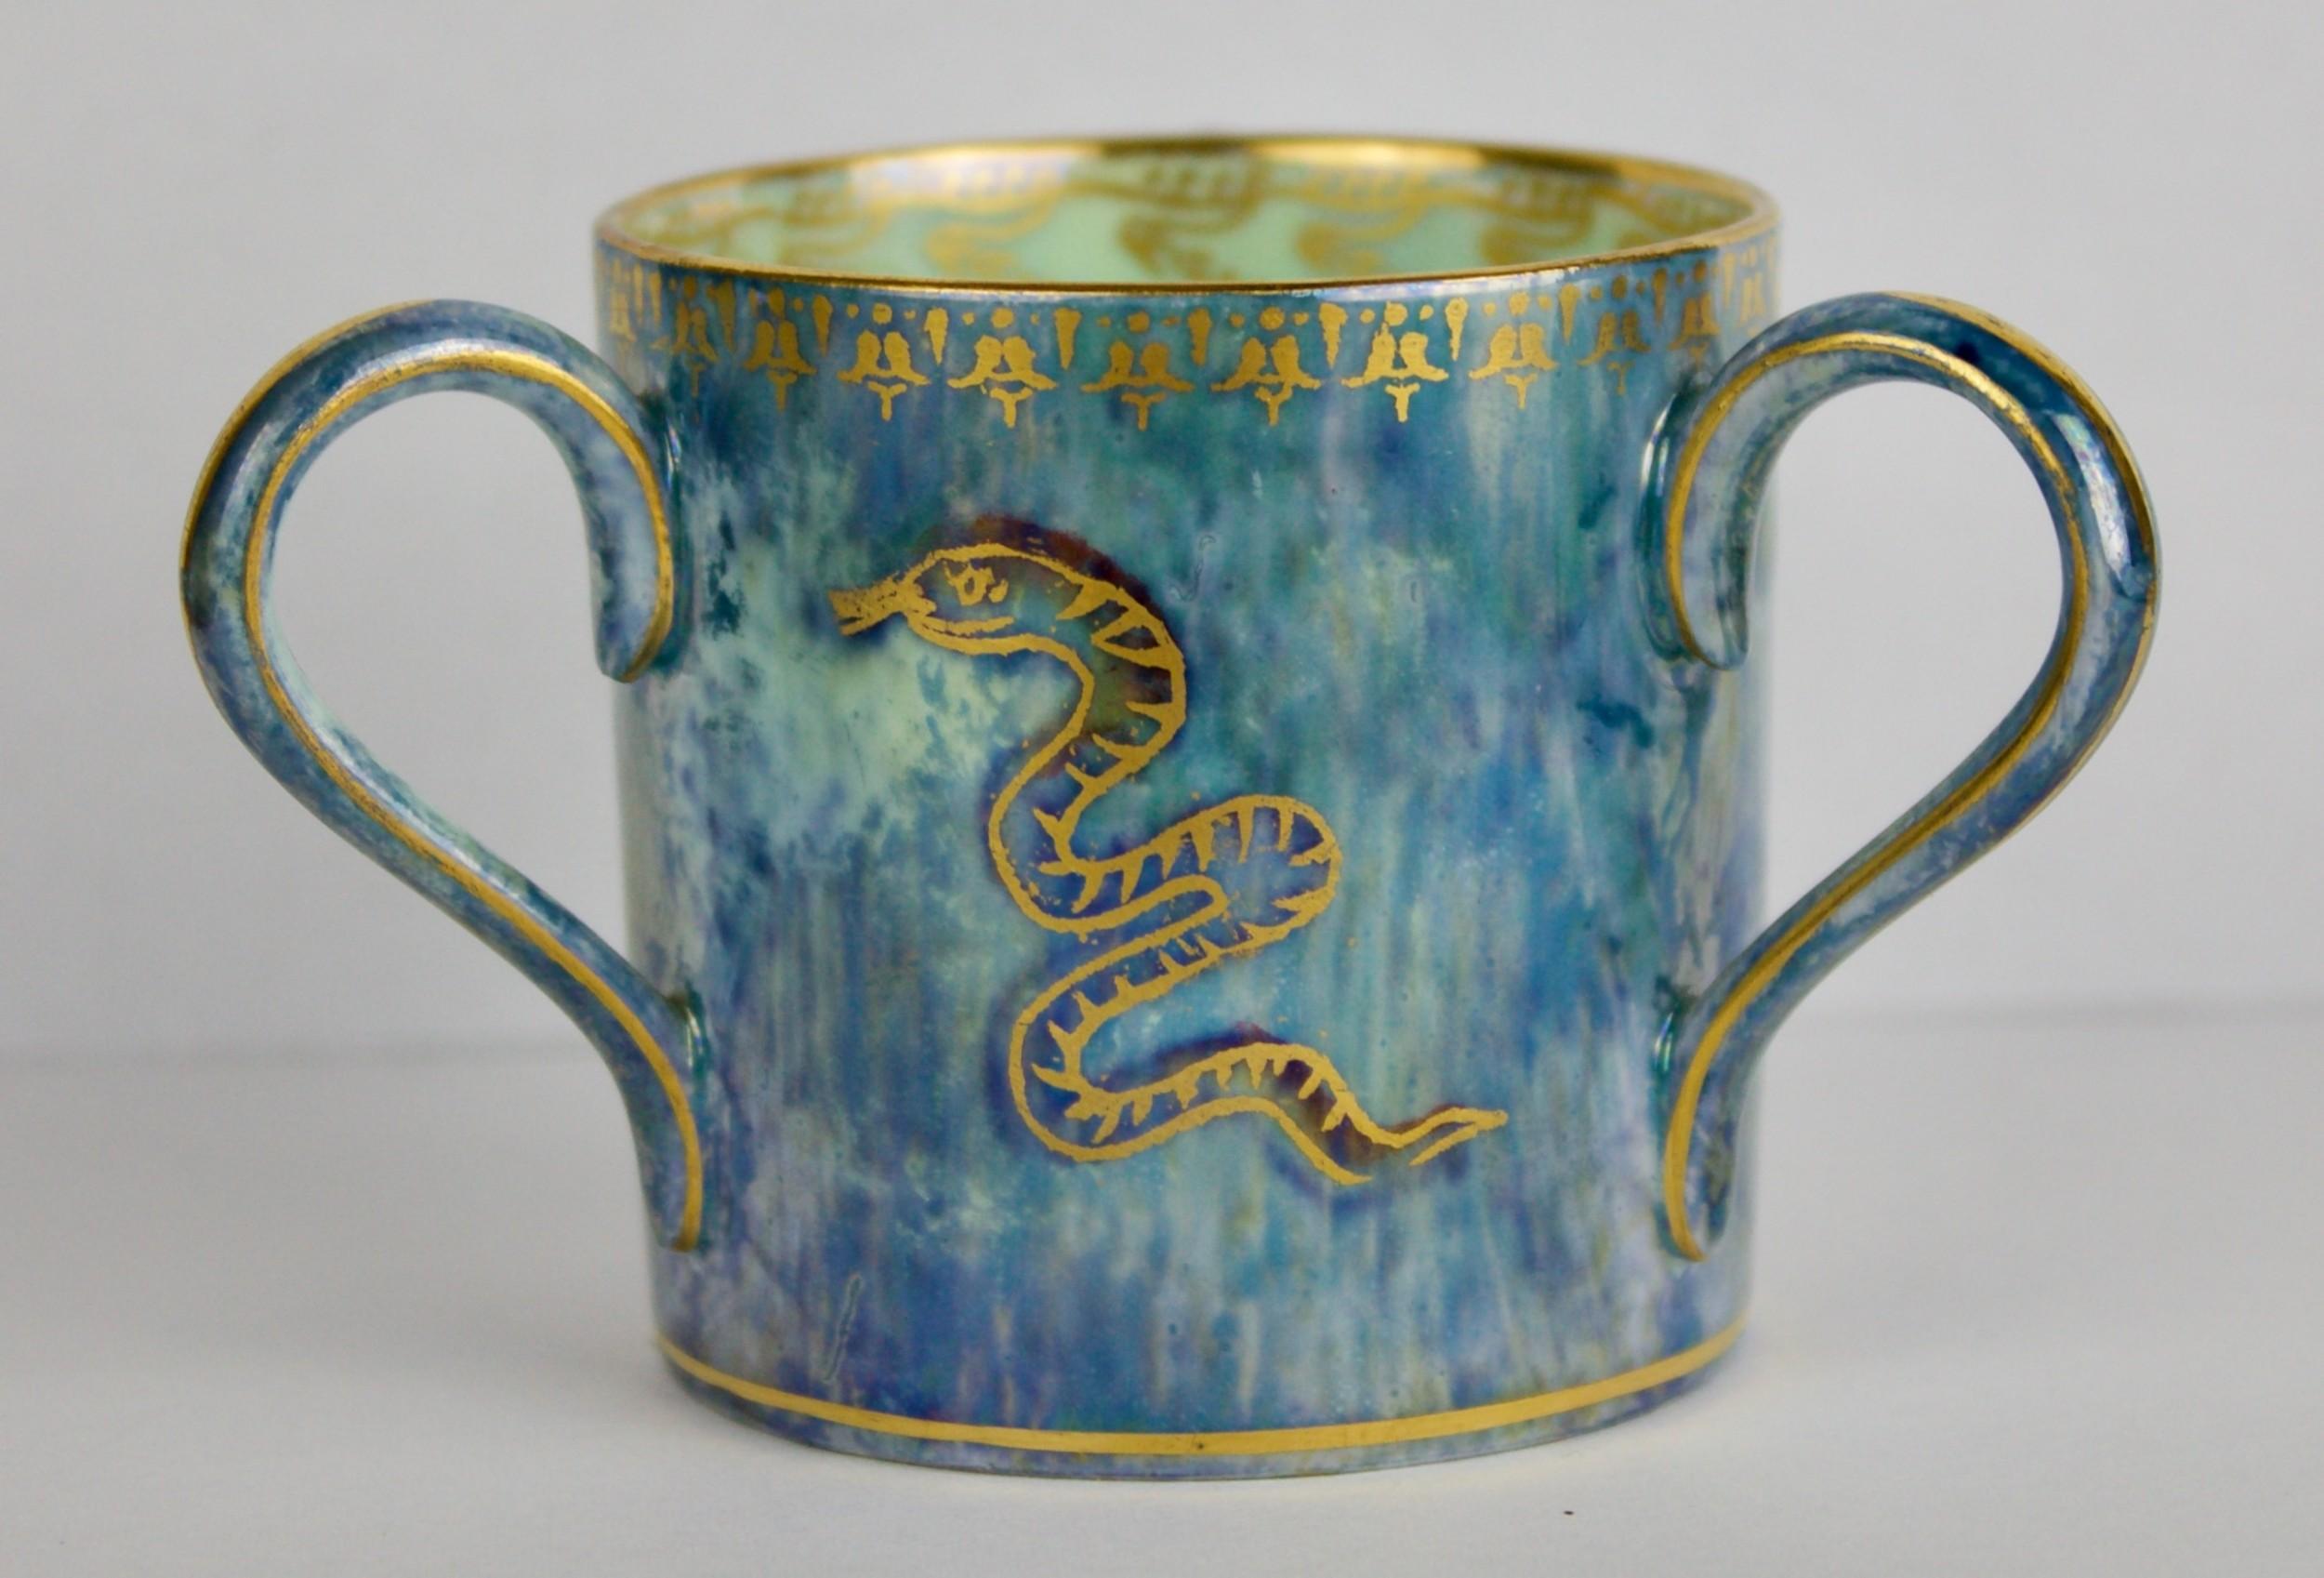 wedgwood lustre tyg loving cup